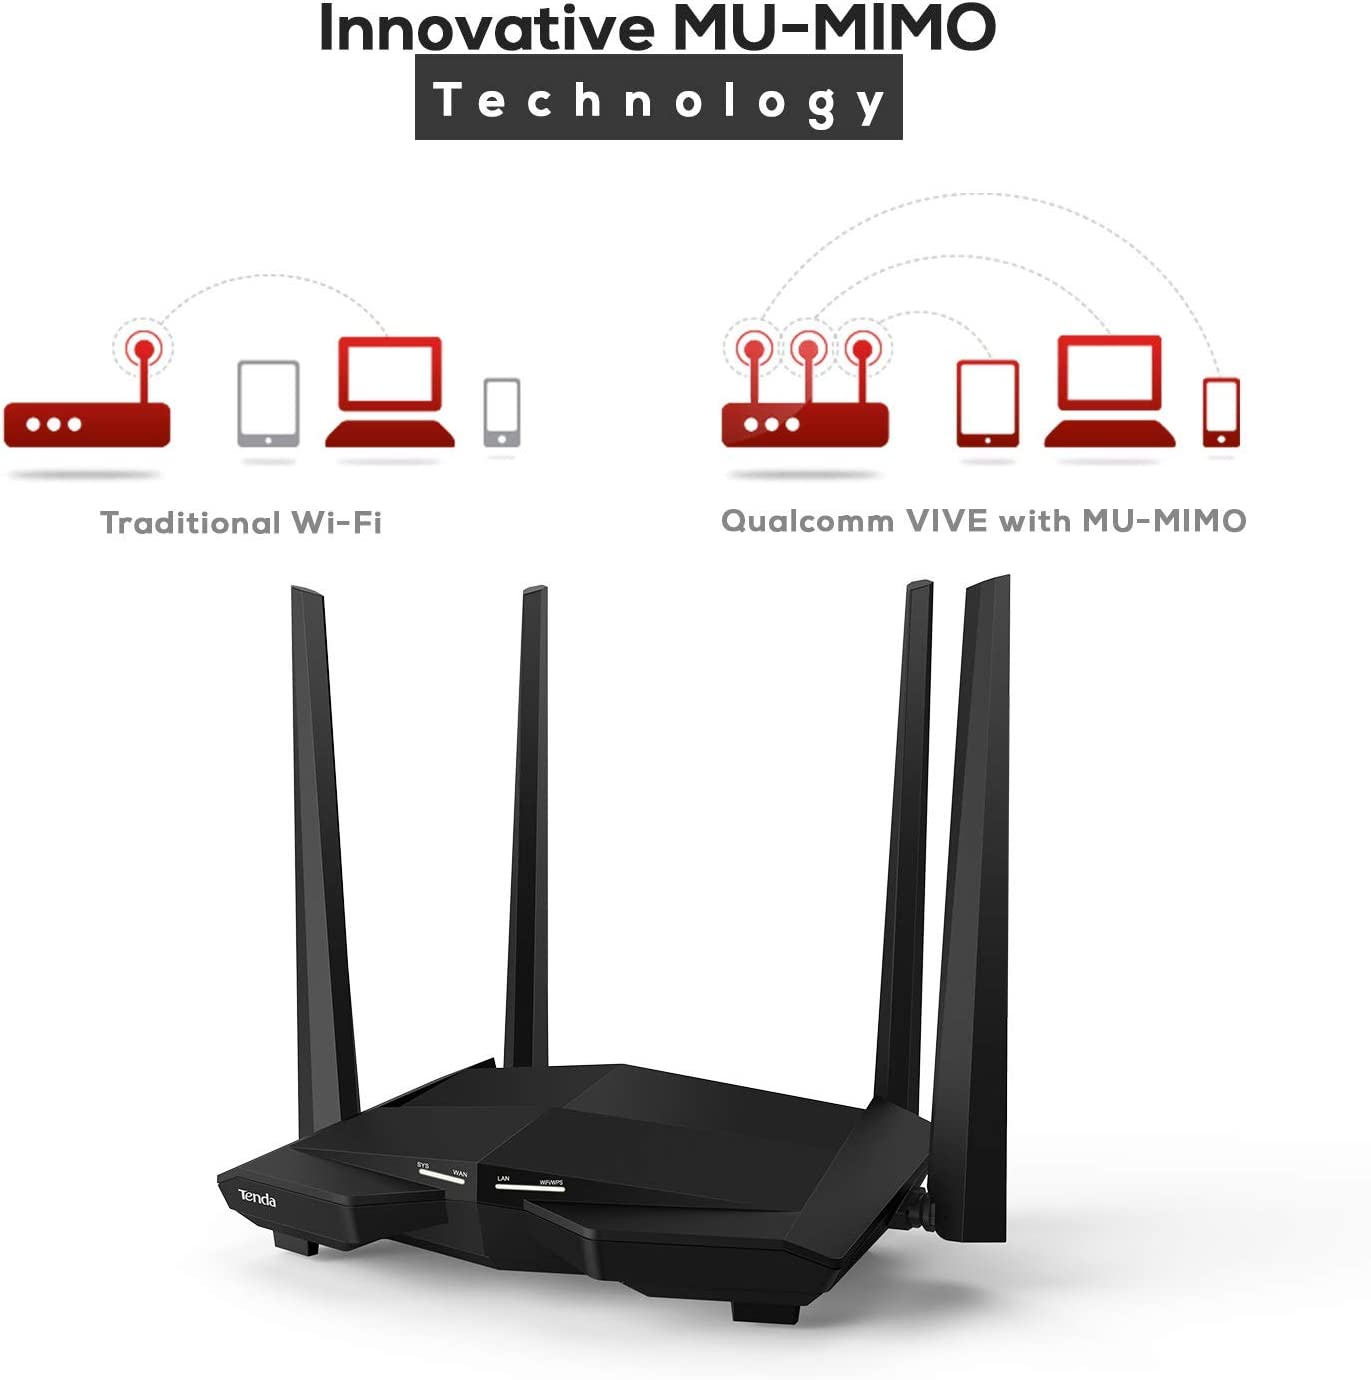 Tenda AC10 Router WiFi Inalámbrico Gigabit AC1200 (Doble Banda 5GHz 867 Mbps 2,4 GHz 300 Mbps, 4 Antenas 5 dbi, Chip Broadcom 1GHz, Memoria ddr3, ...